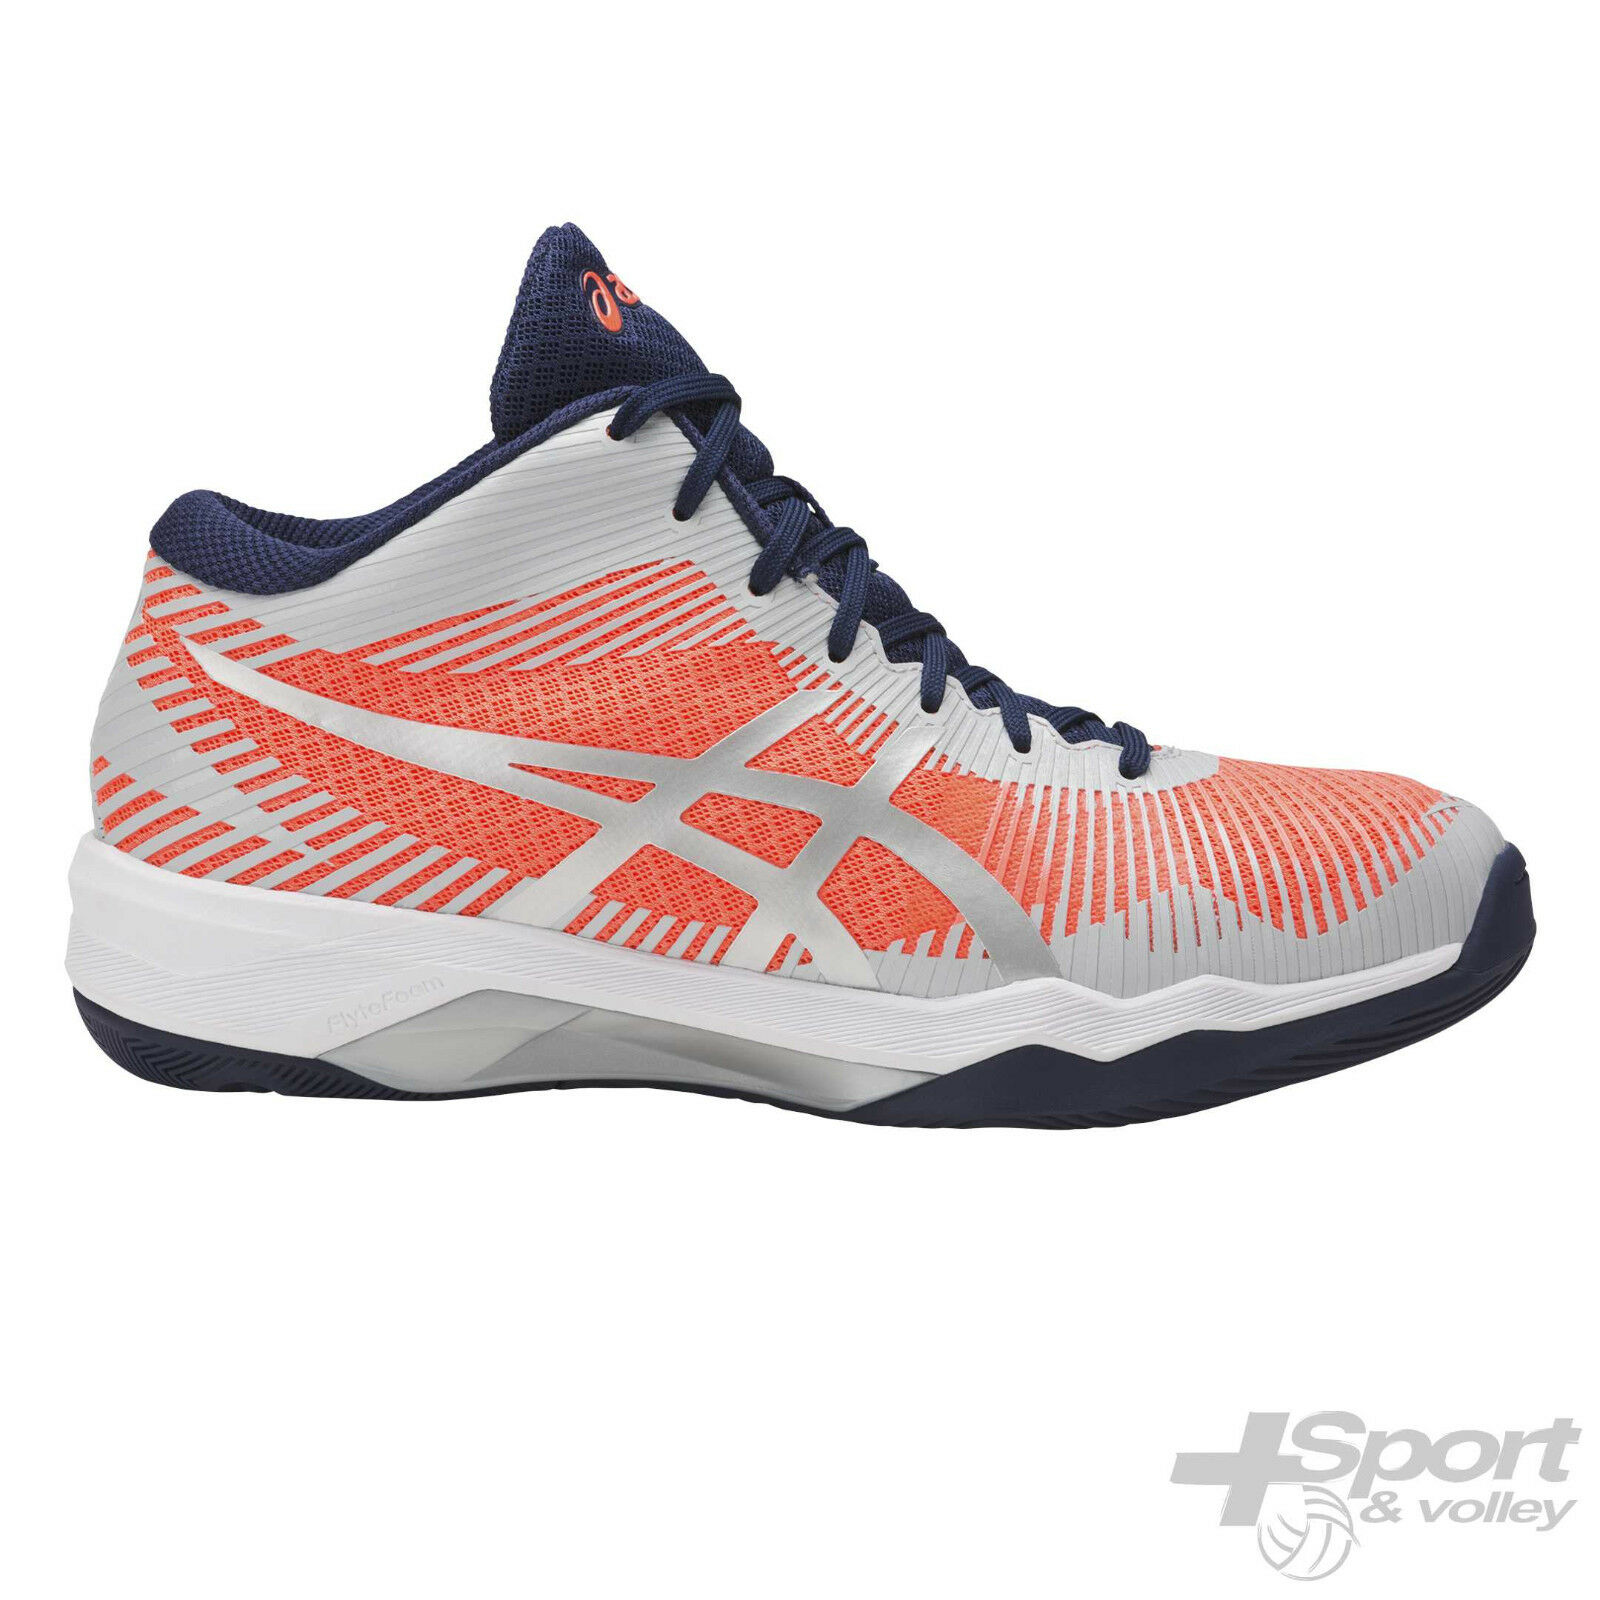 Scarpa volley Asics Volley Elite FF Mid Donna B750N 0696